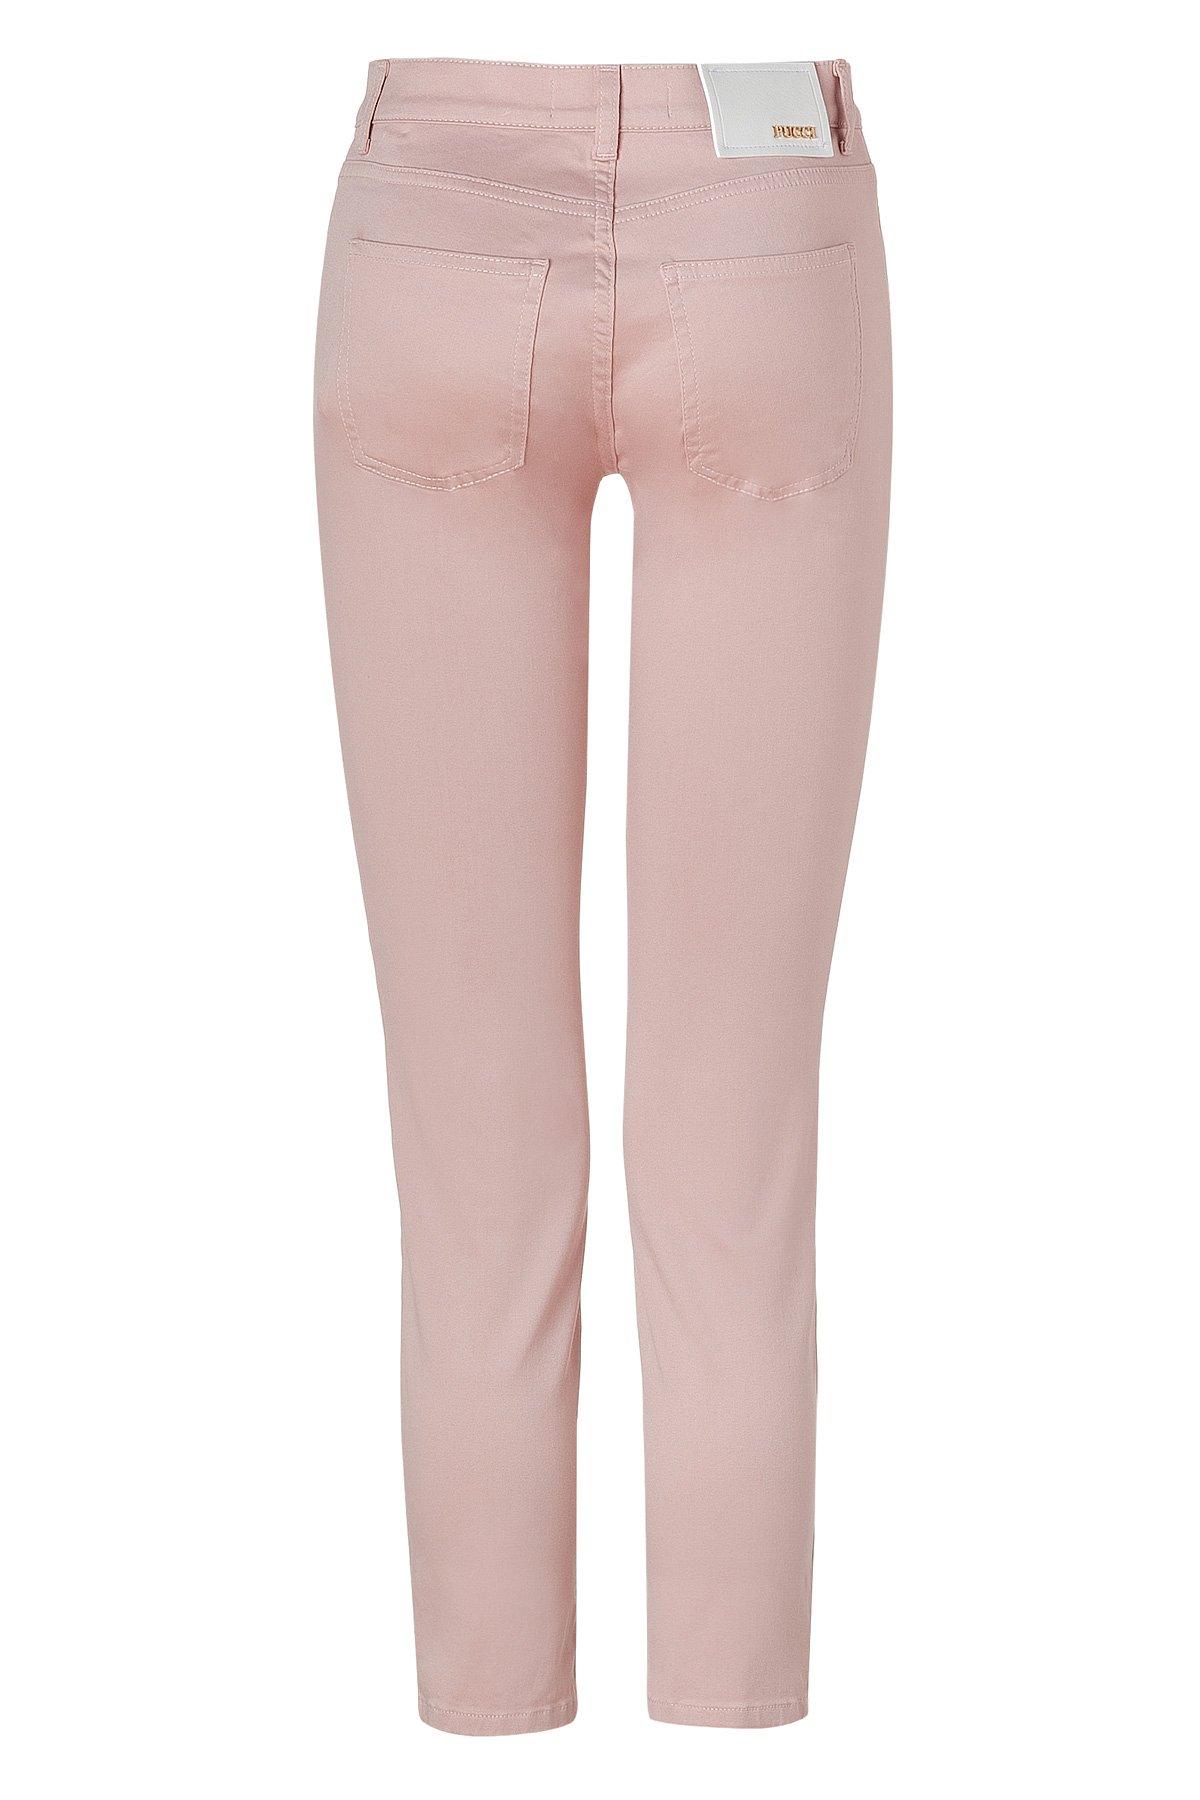 Lyst Emilio Pucci Blush Skinny Jeans In Pink